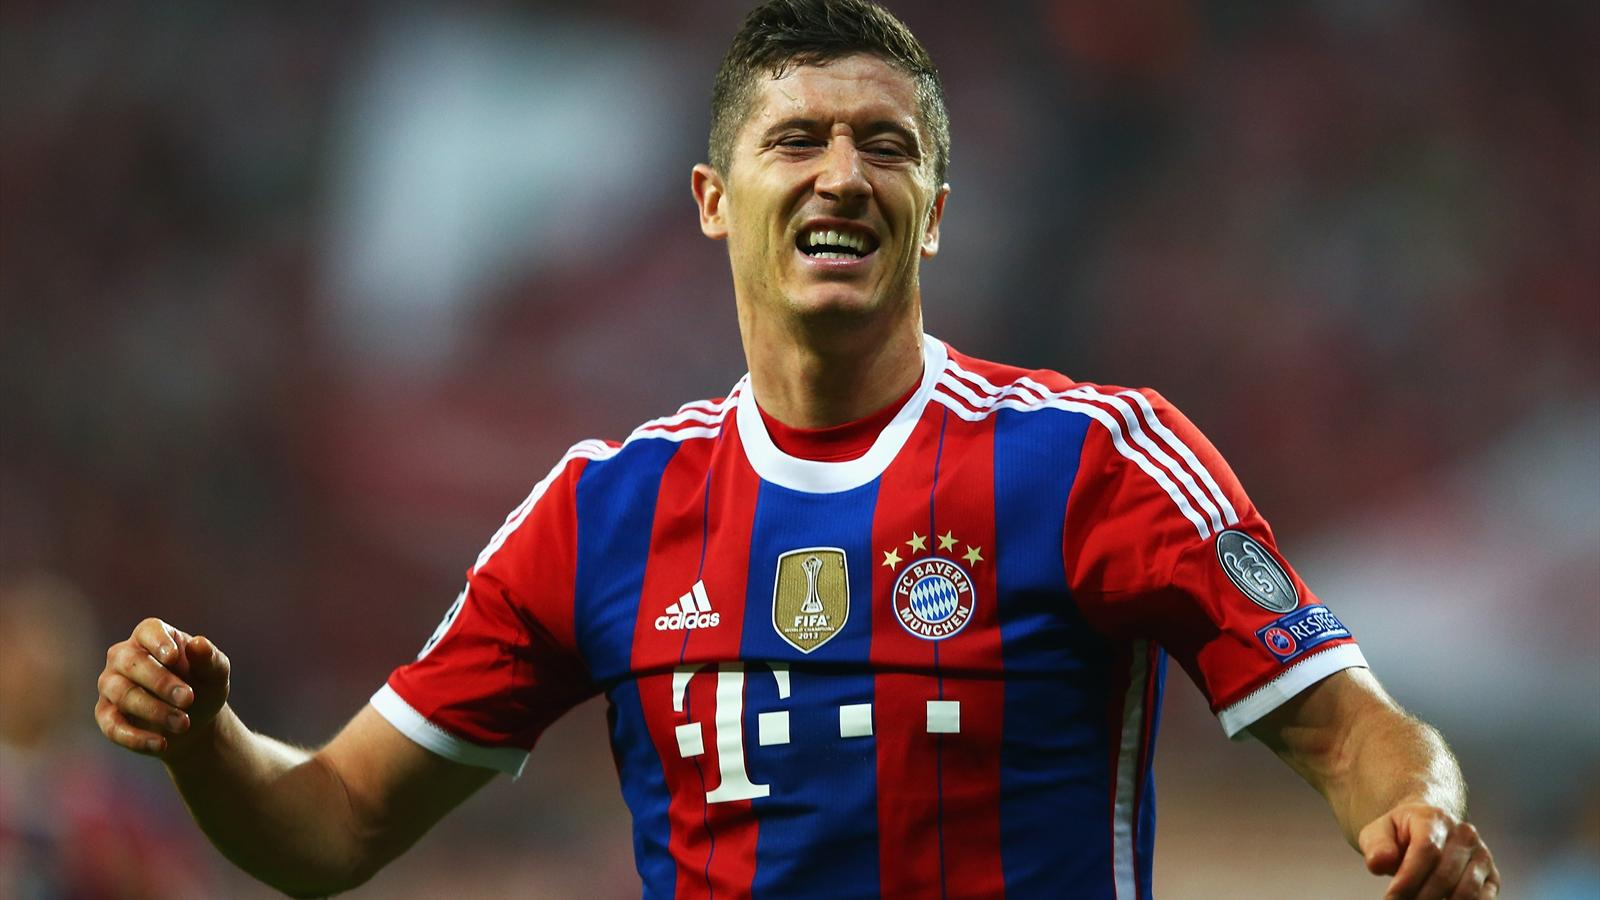 Bayern side to enter empty CSKA stadium - Champions League 2014-2015 ...